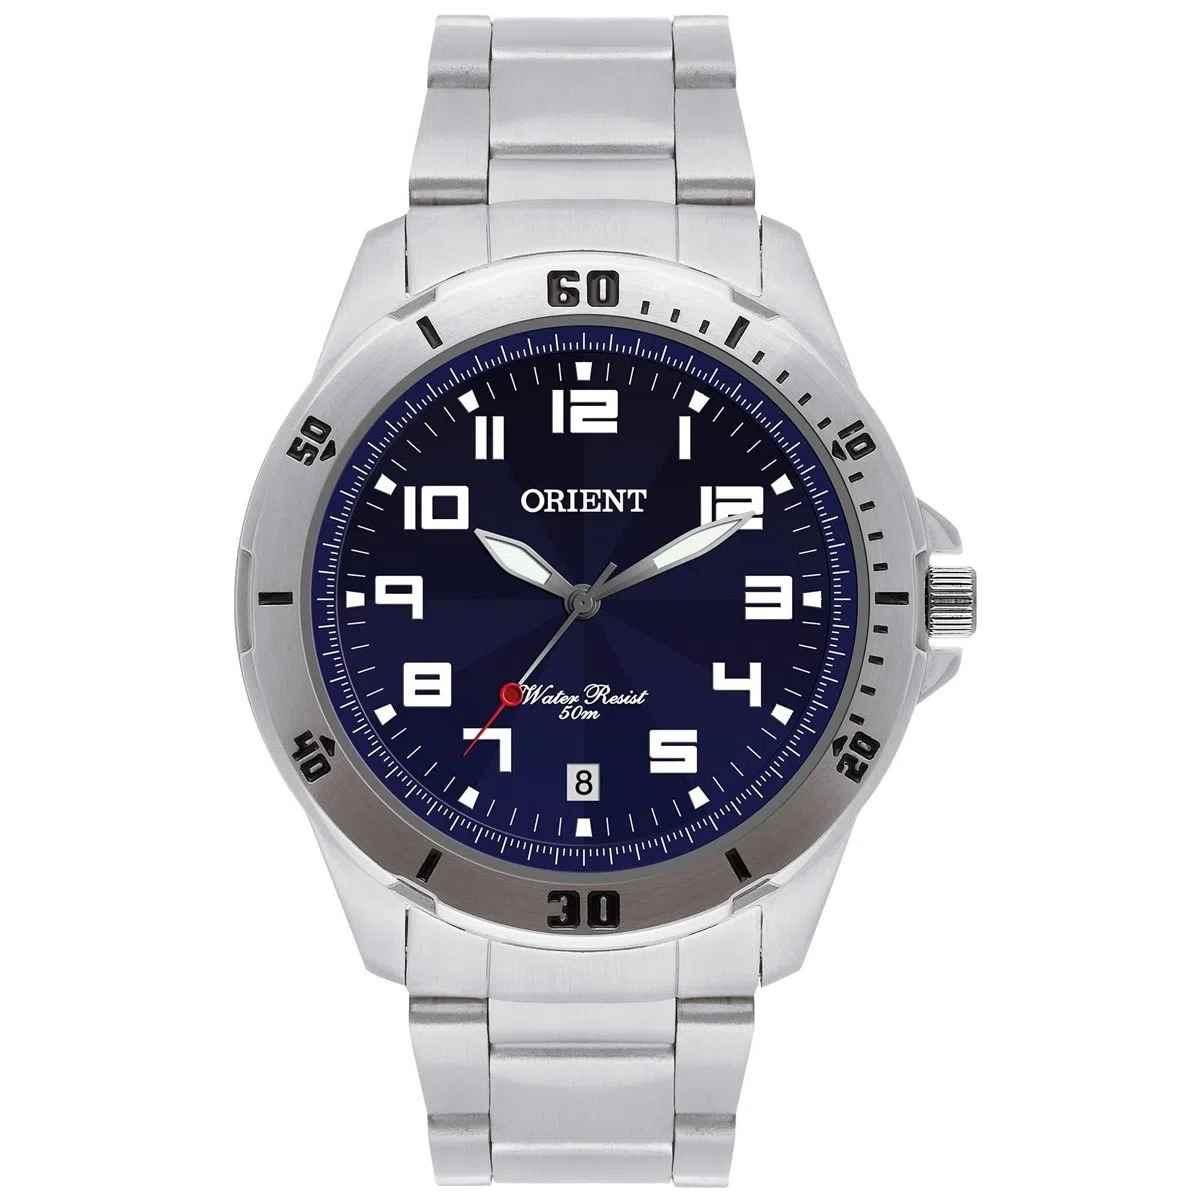 Relógio Orient Masculino Analógico Prateado Fundo Azul MBSS1155A D2SX